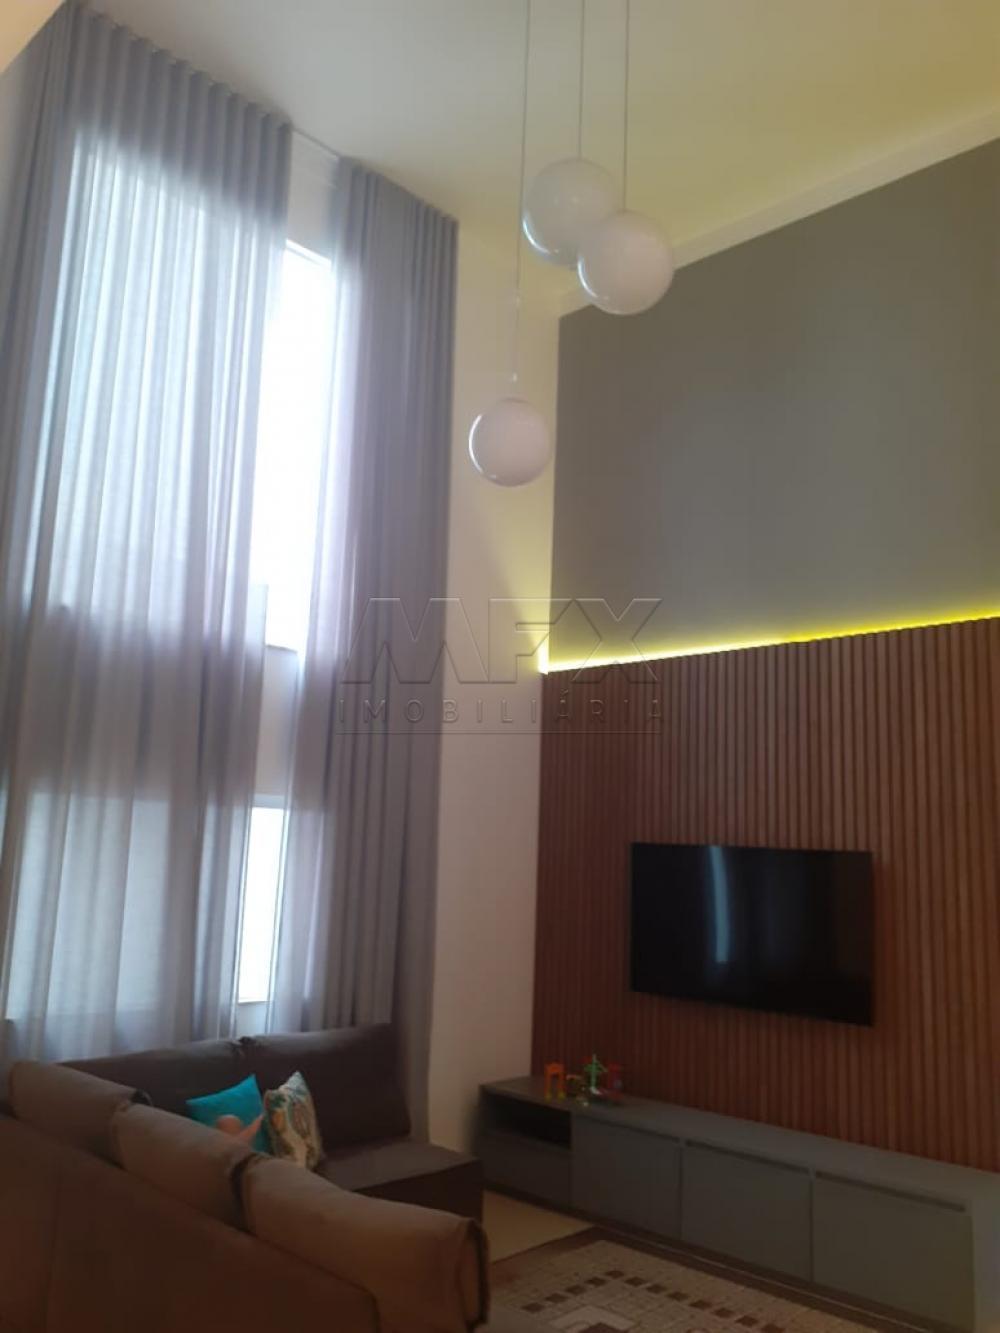 Comprar Casa / Condomínio em Bauru R$ 1.900.000,00 - Foto 10